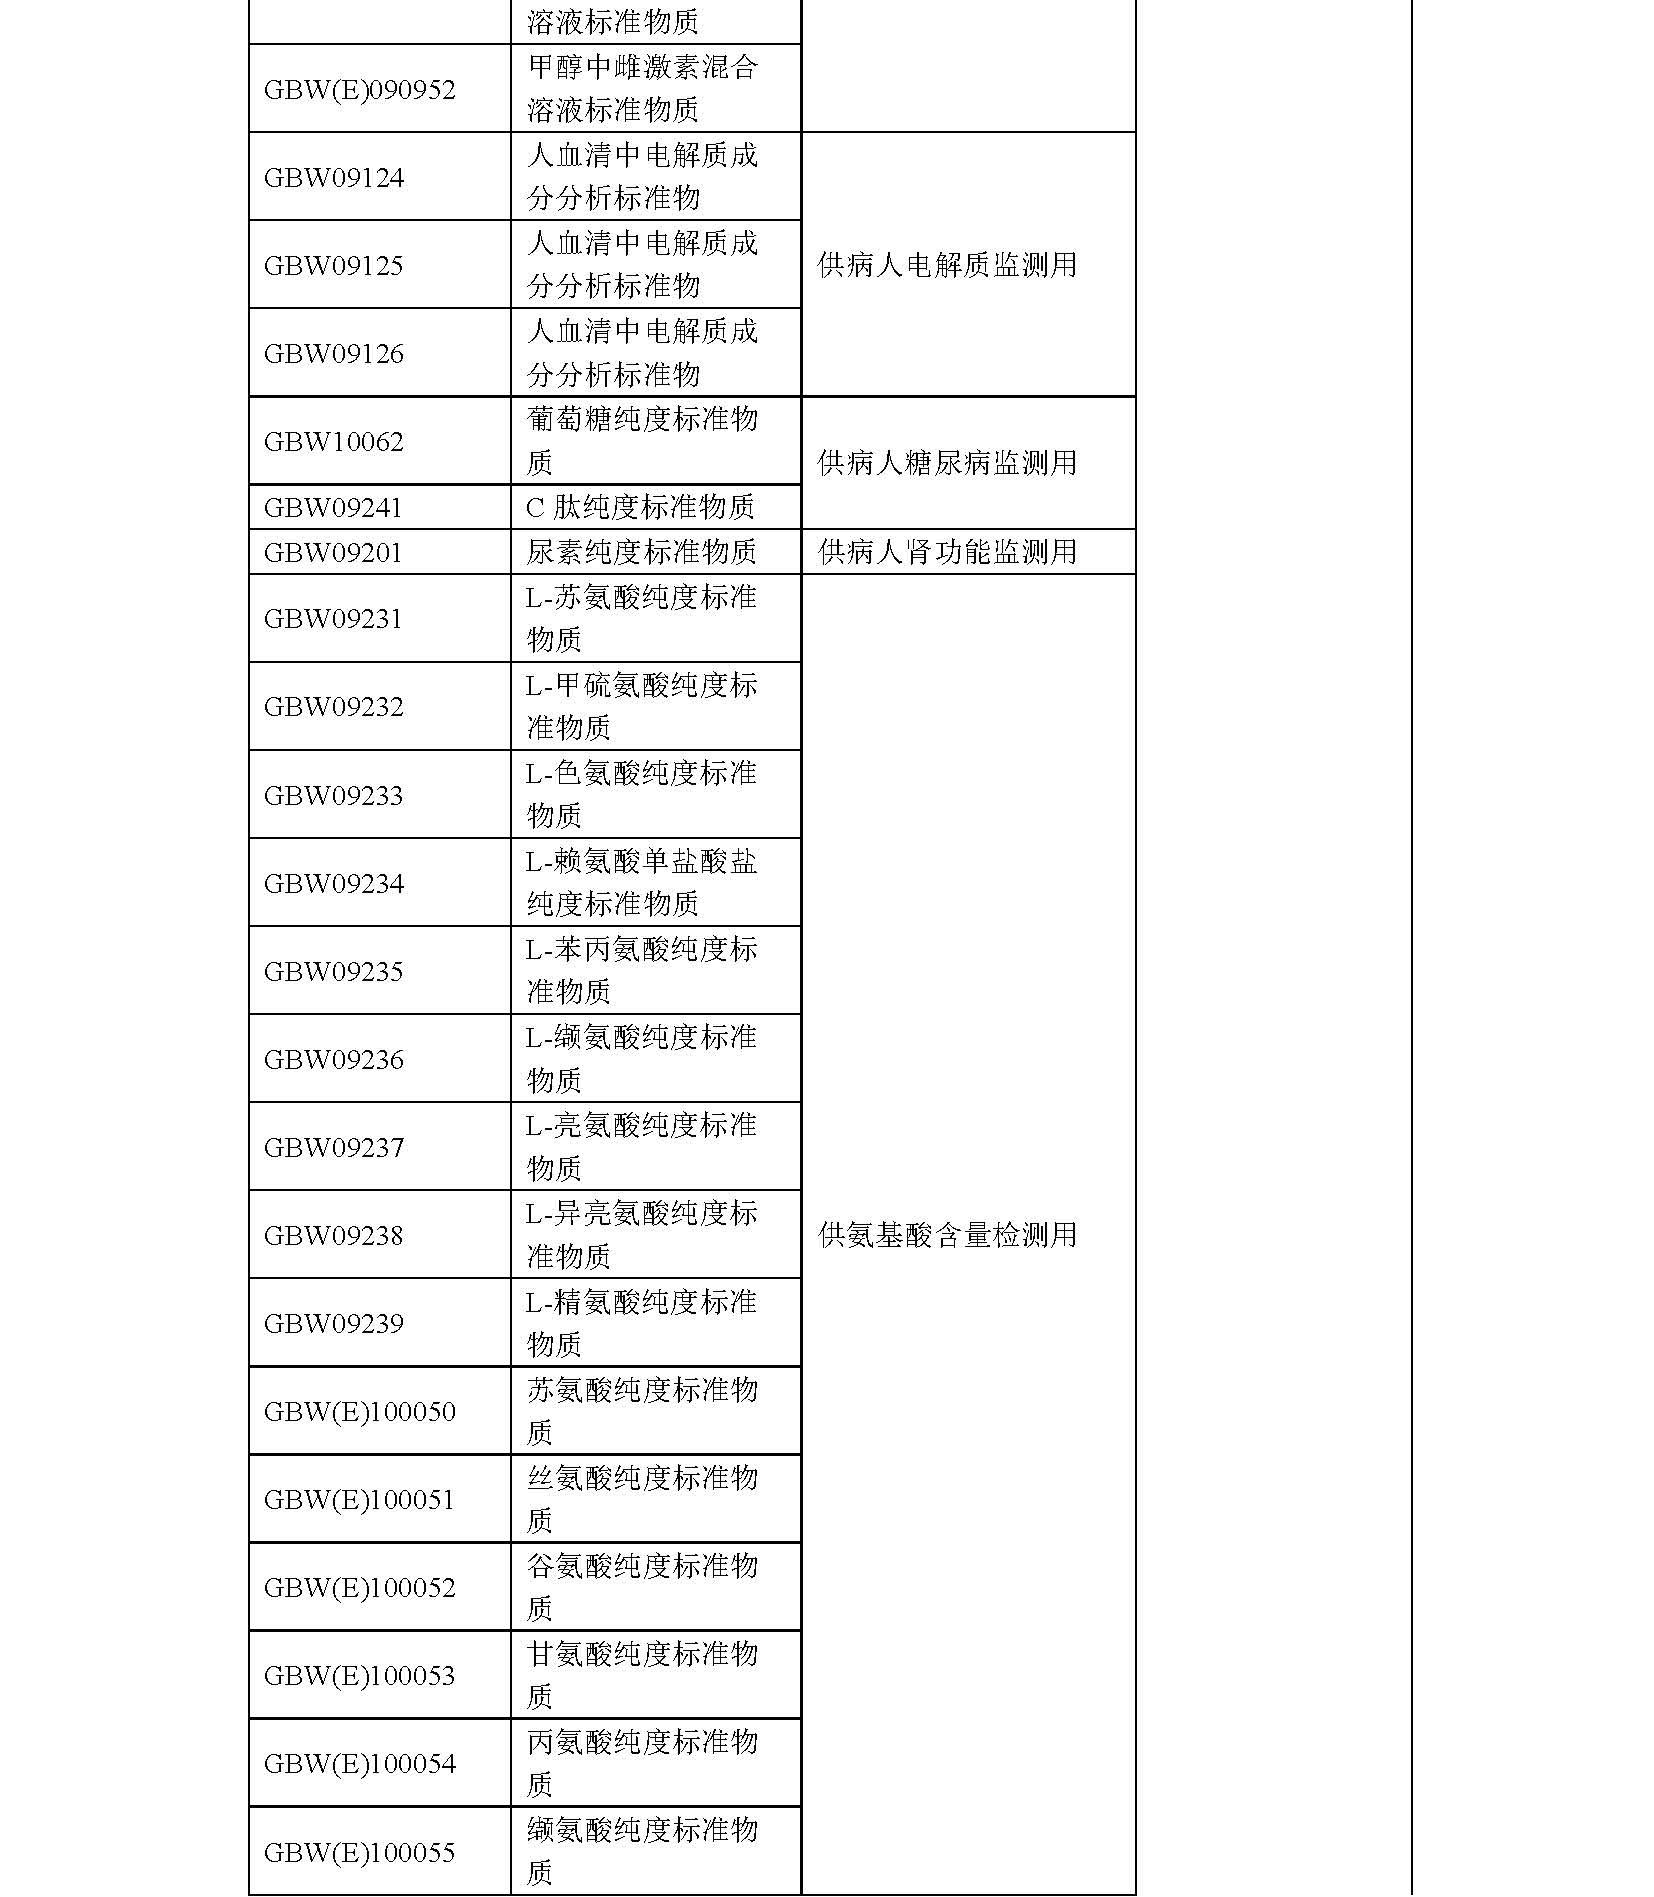 5b96f16e-37be-47a1-9ab8-3388d589c280.jpg